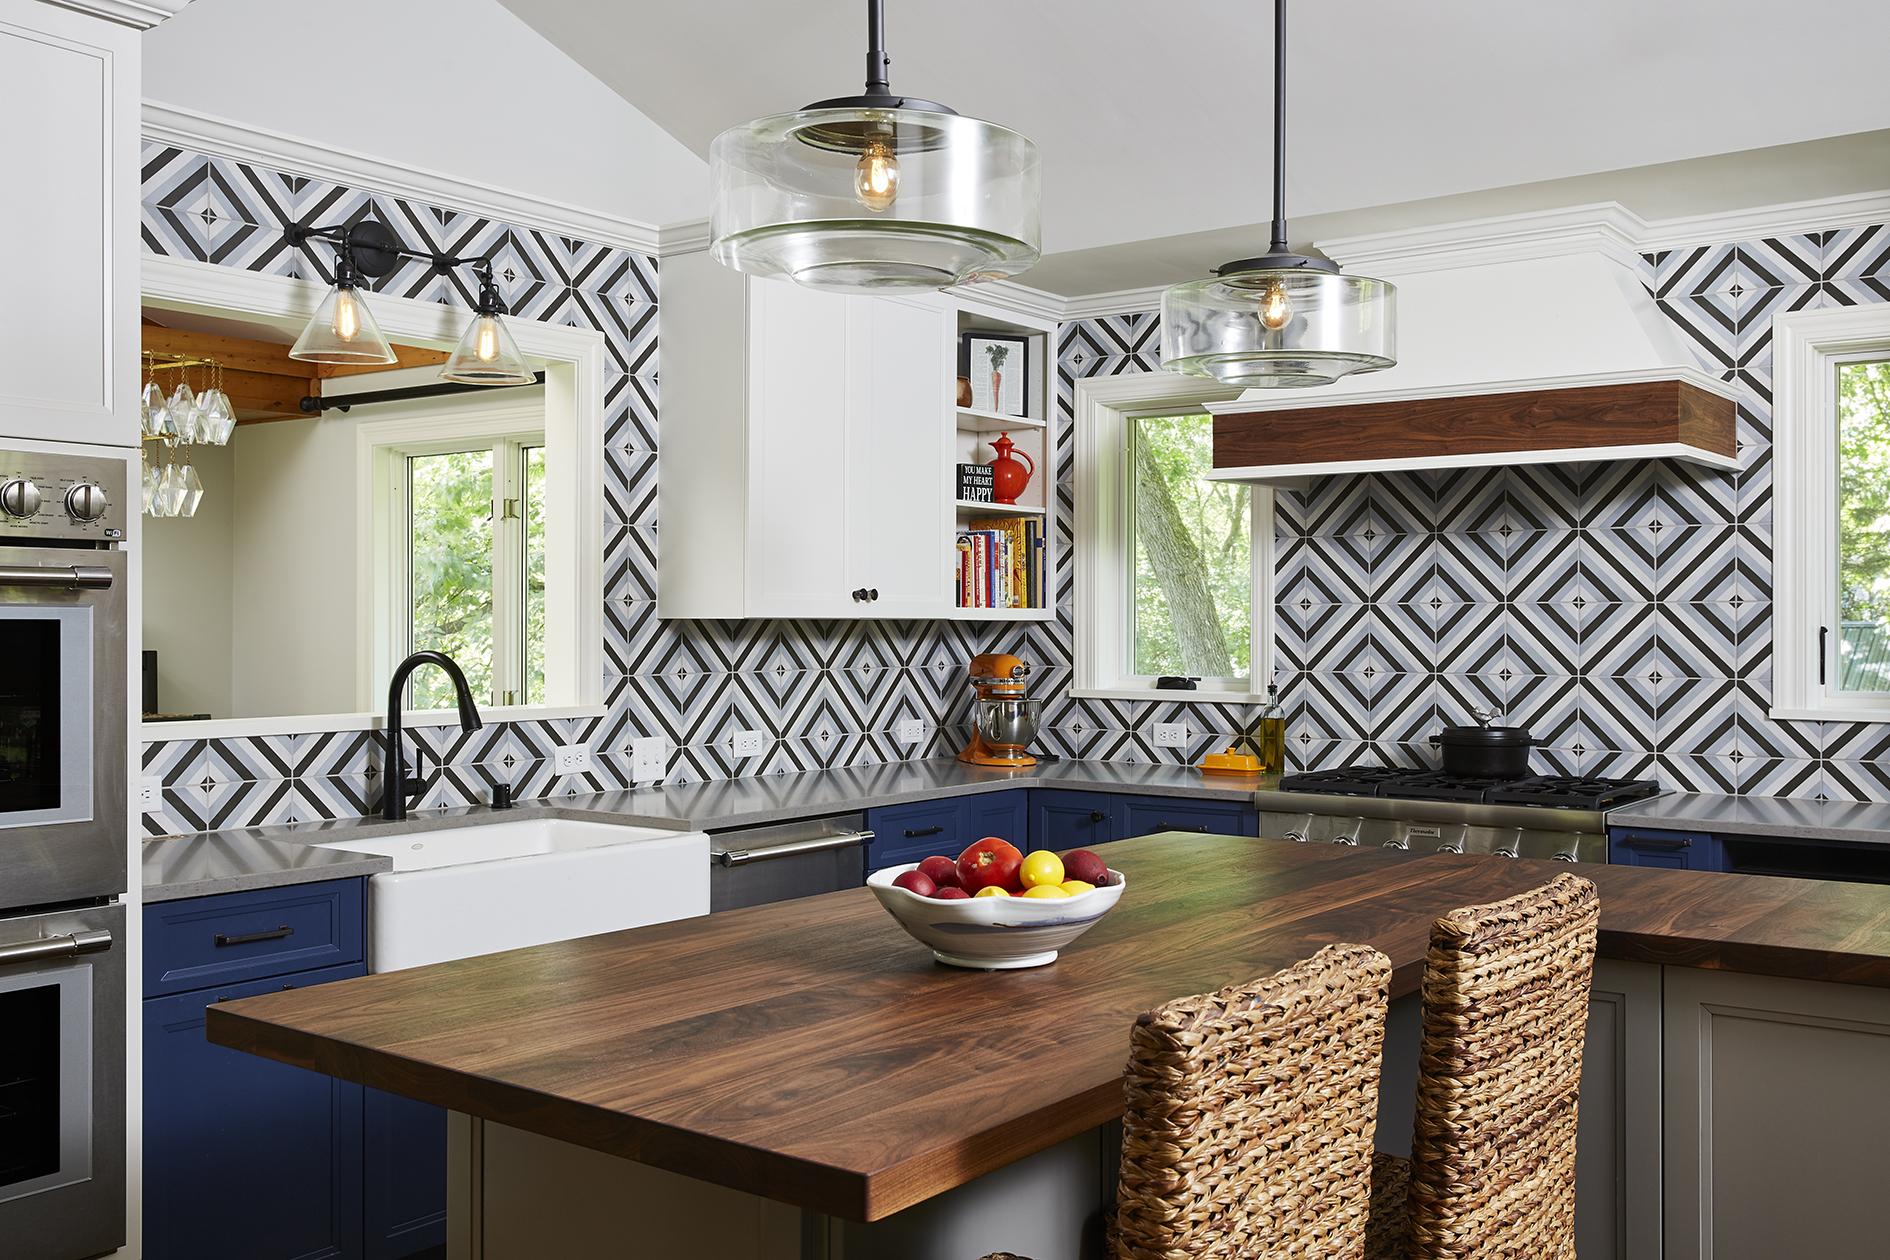 Bluestem Kitchen Project Featured on Houzz.com!